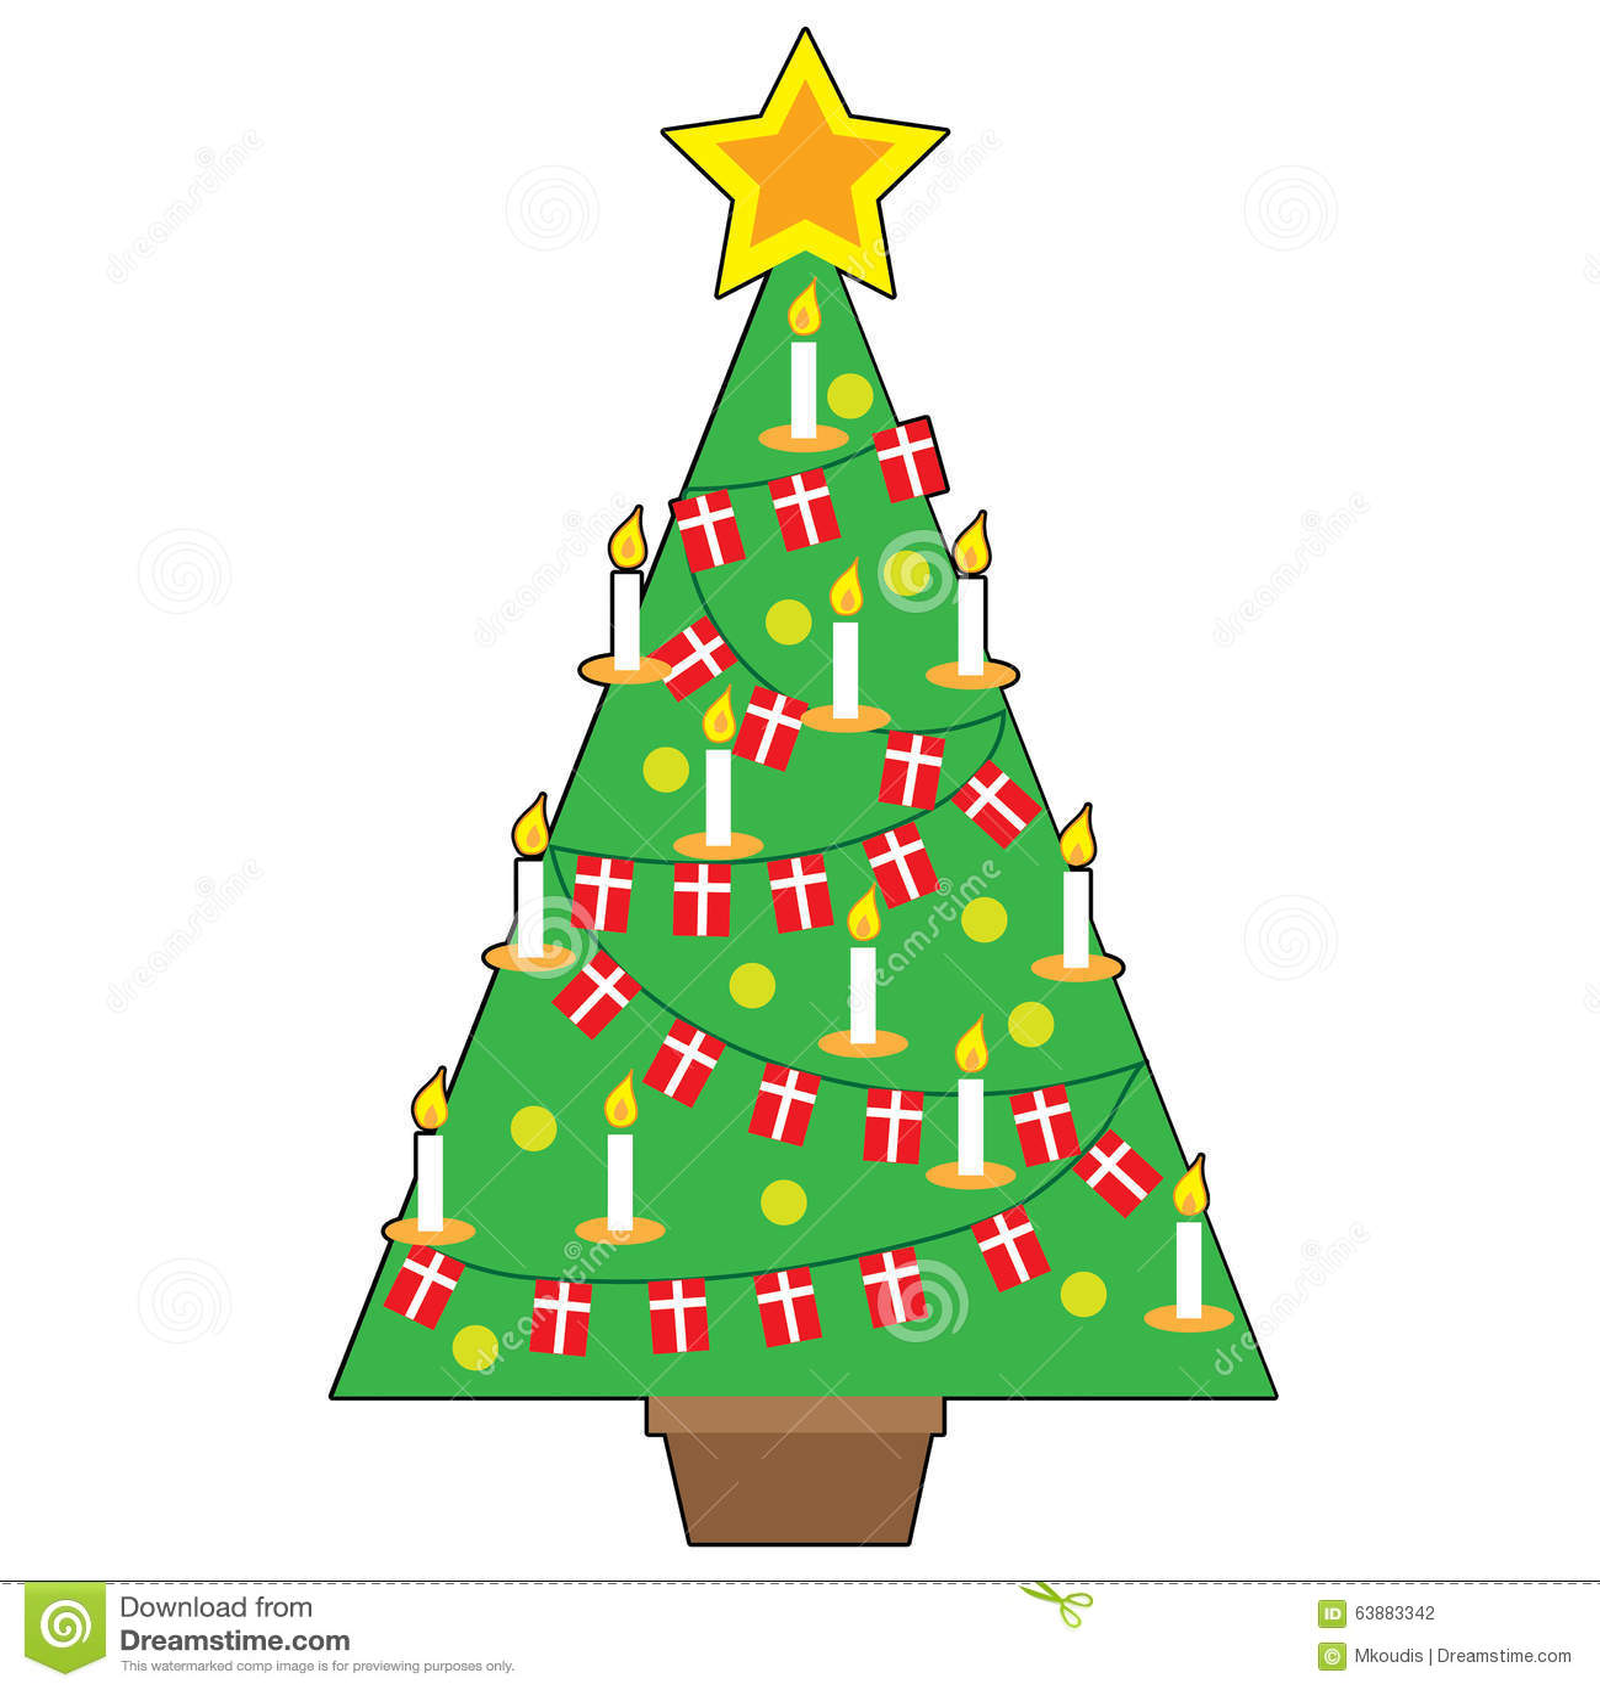 Danish Christmas Trees: Danish Christmas Tree Stock Vector. Illustration Of